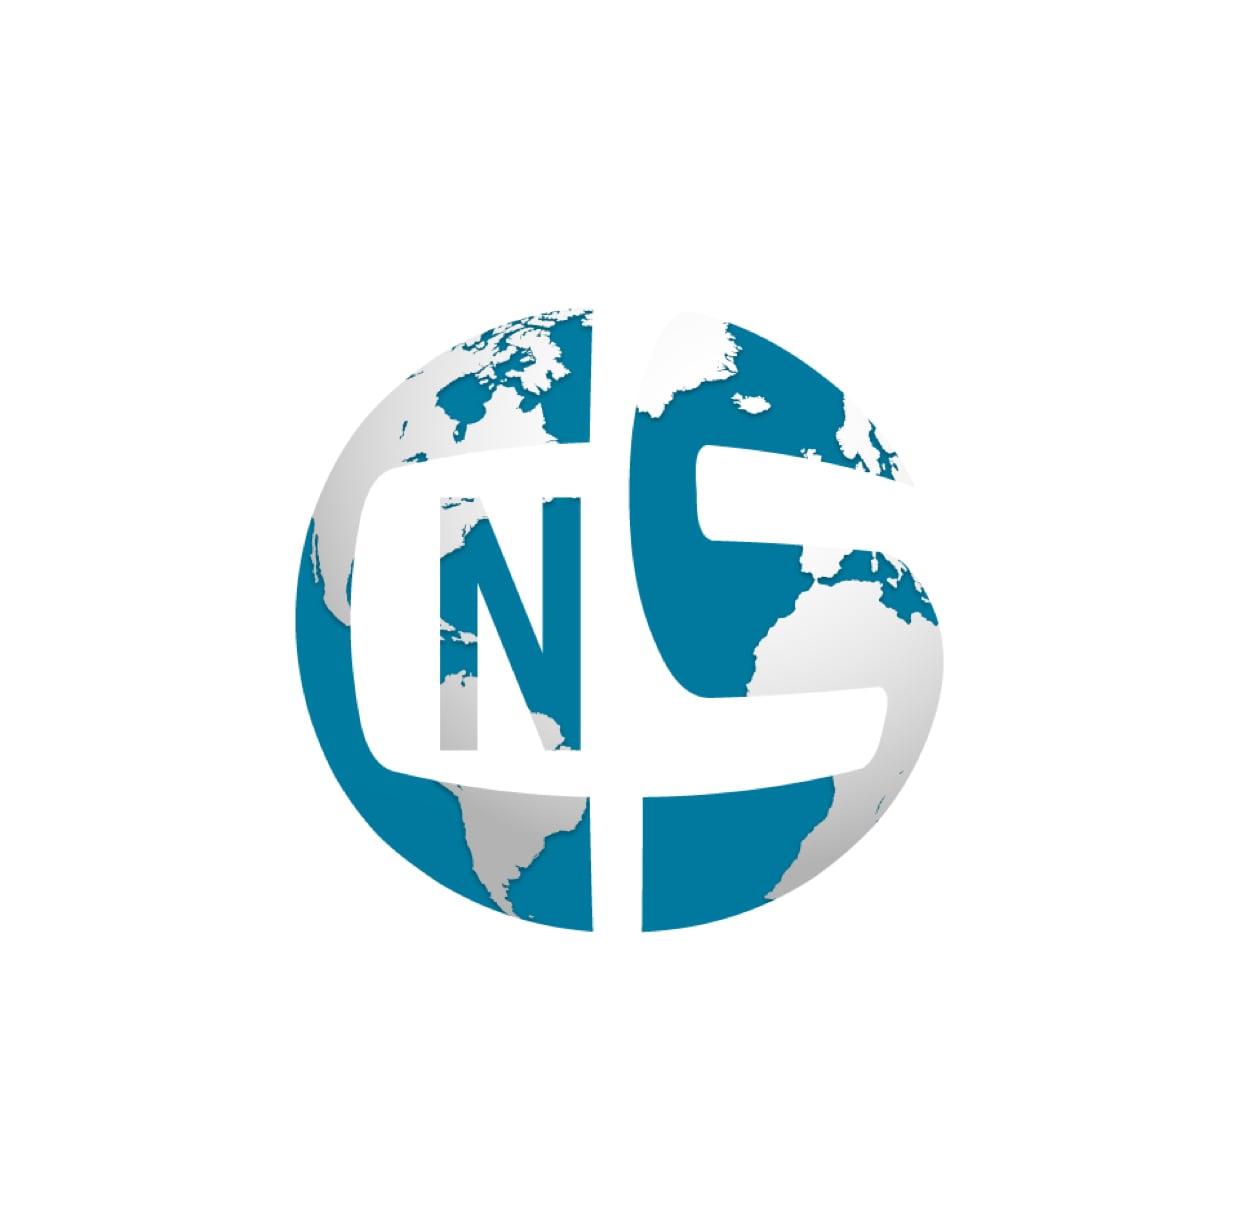 Coil N Soil Services logo